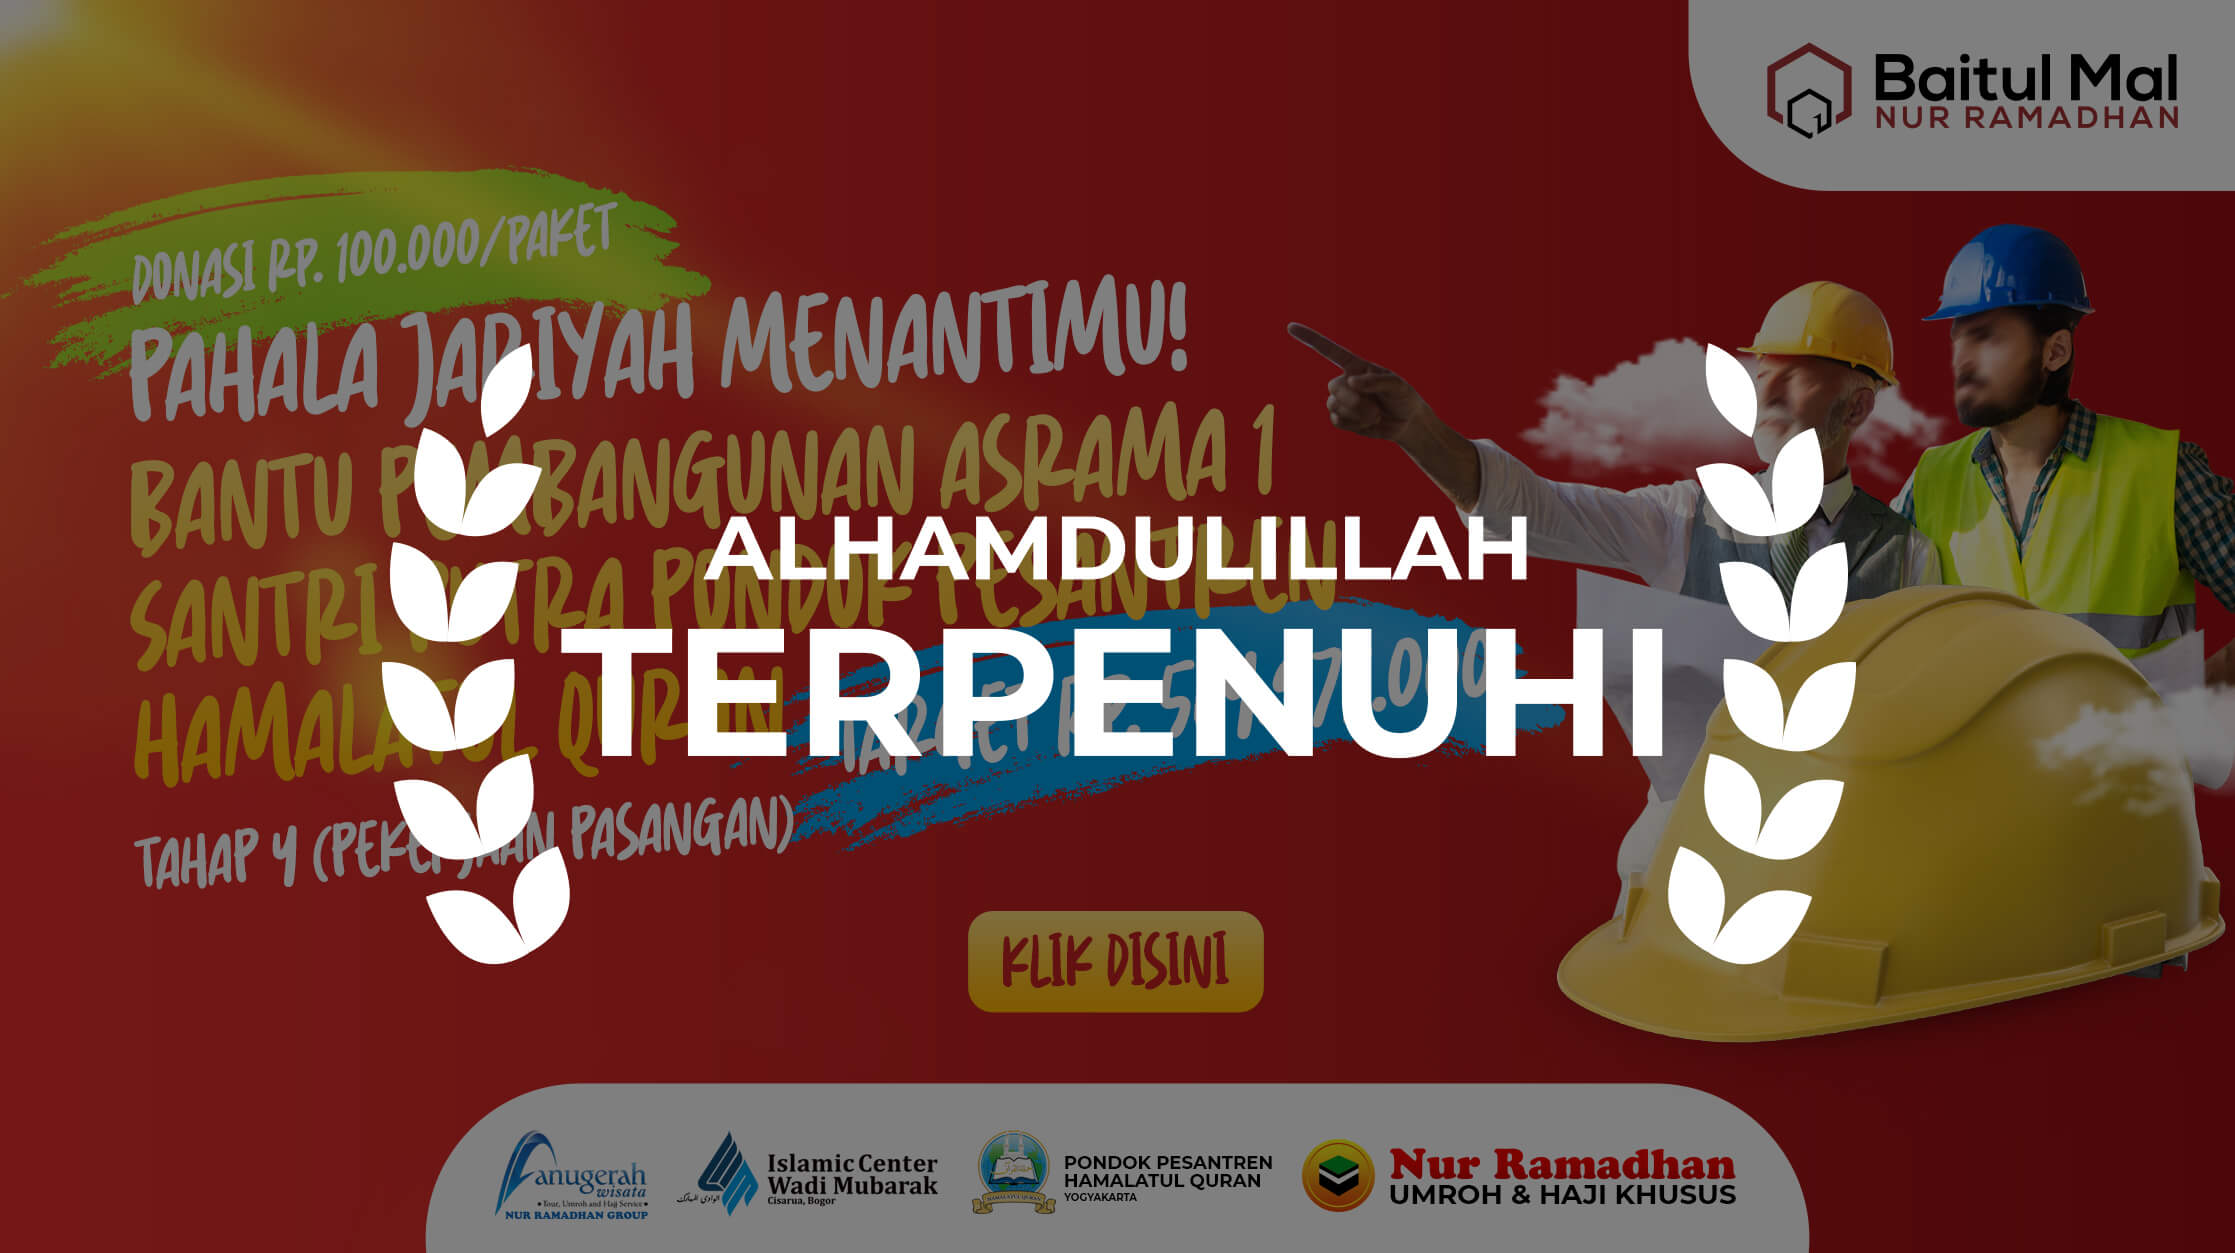 PEMBANGUNAN ASRAMA SANTRI TAHAP 4, Baitul Mal Nur Ramadhan